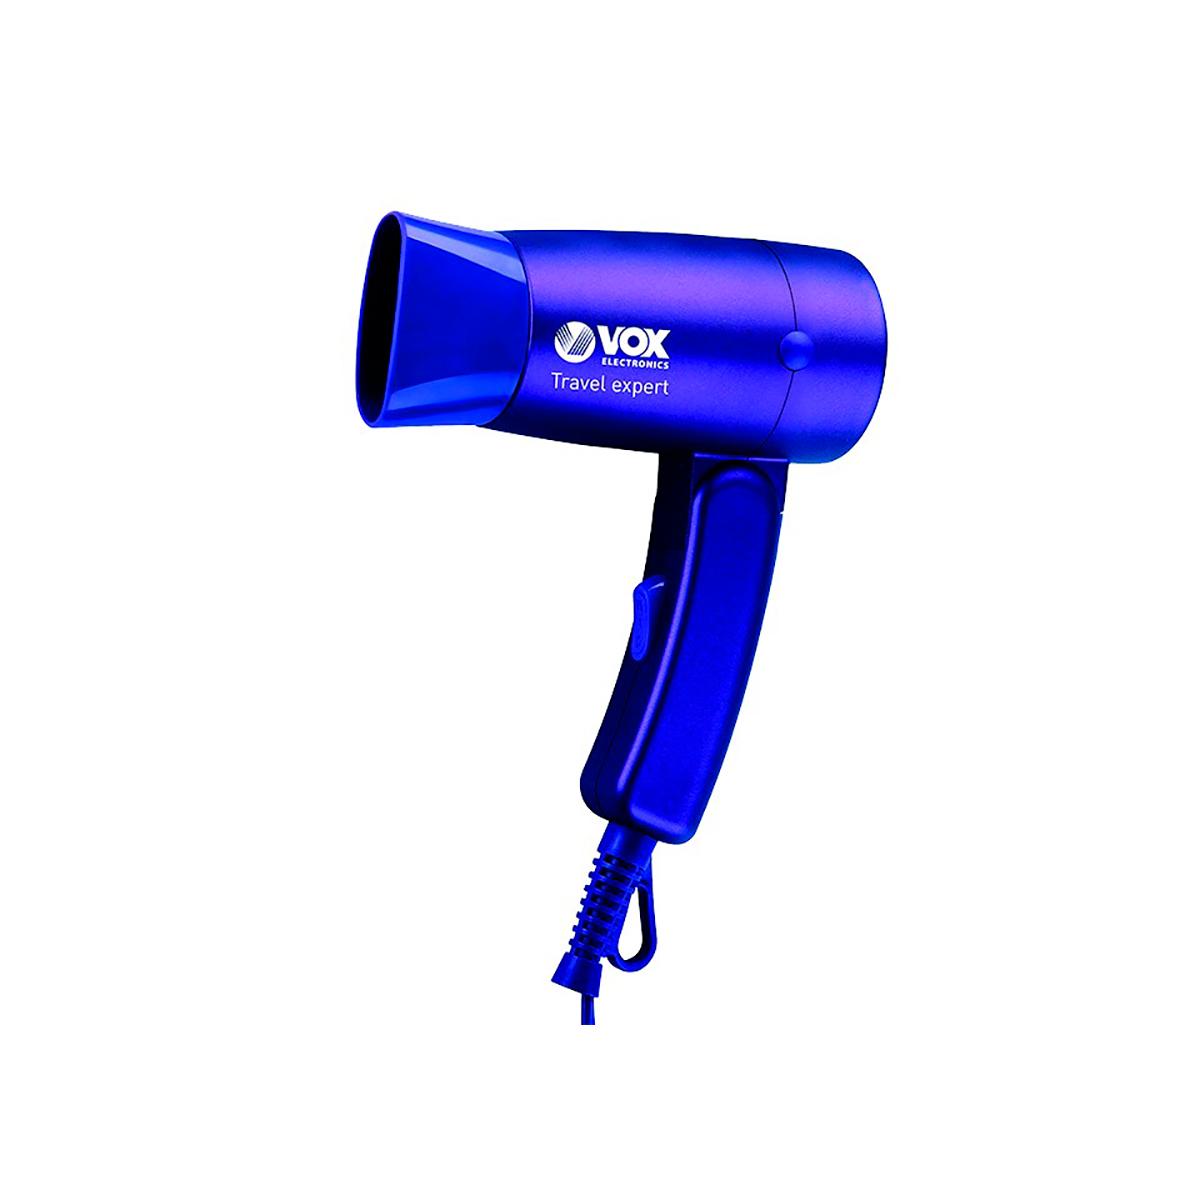 Vox Fen za kosu (HT3064) - ShopNaKlik.rs 021362a88fe